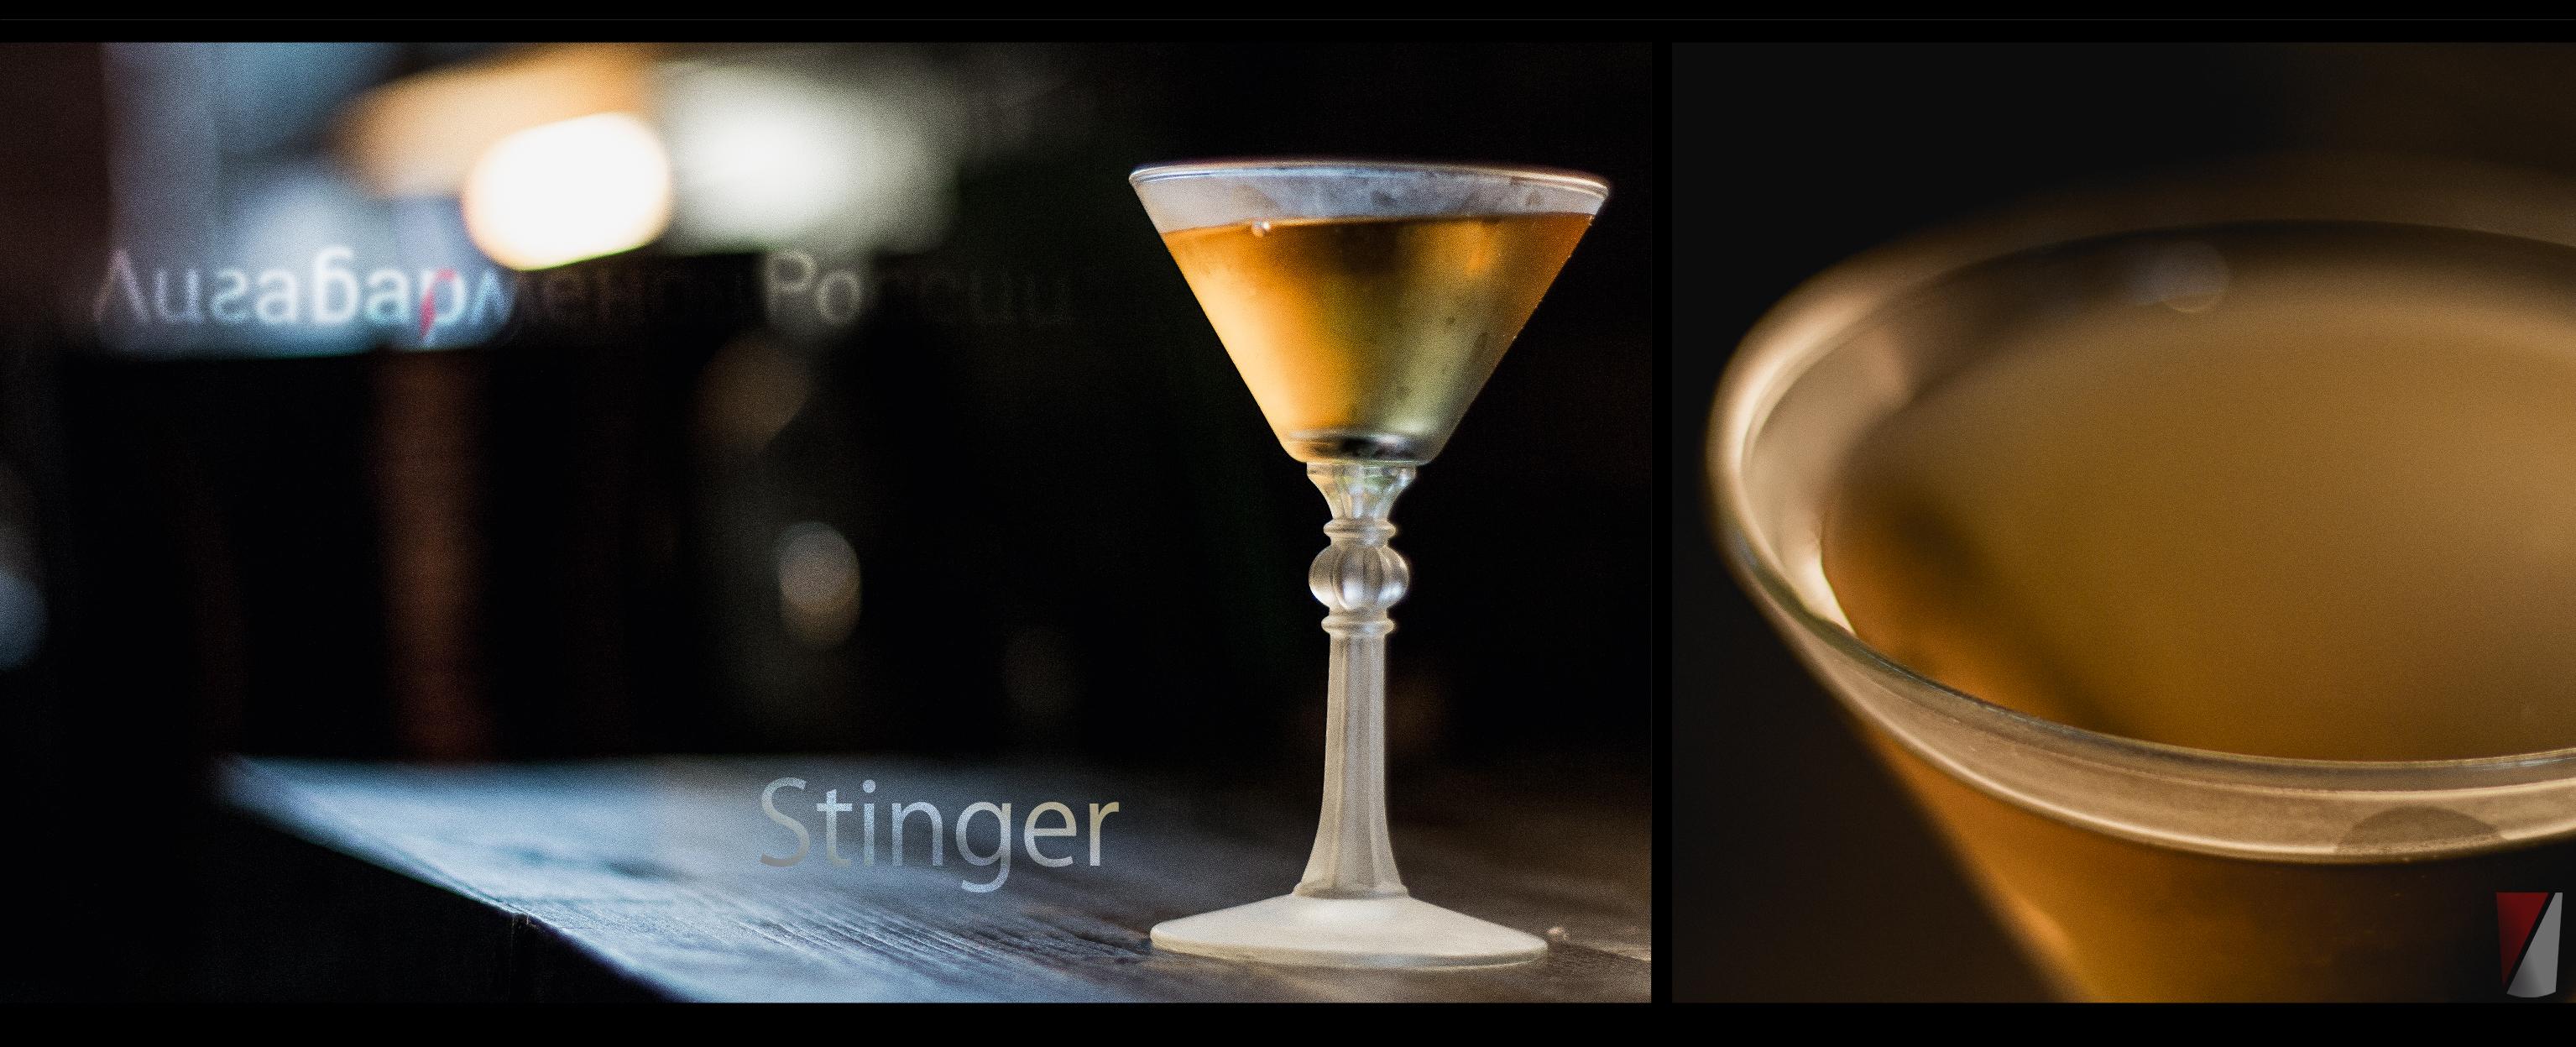 Рецепт коктейля Stinger